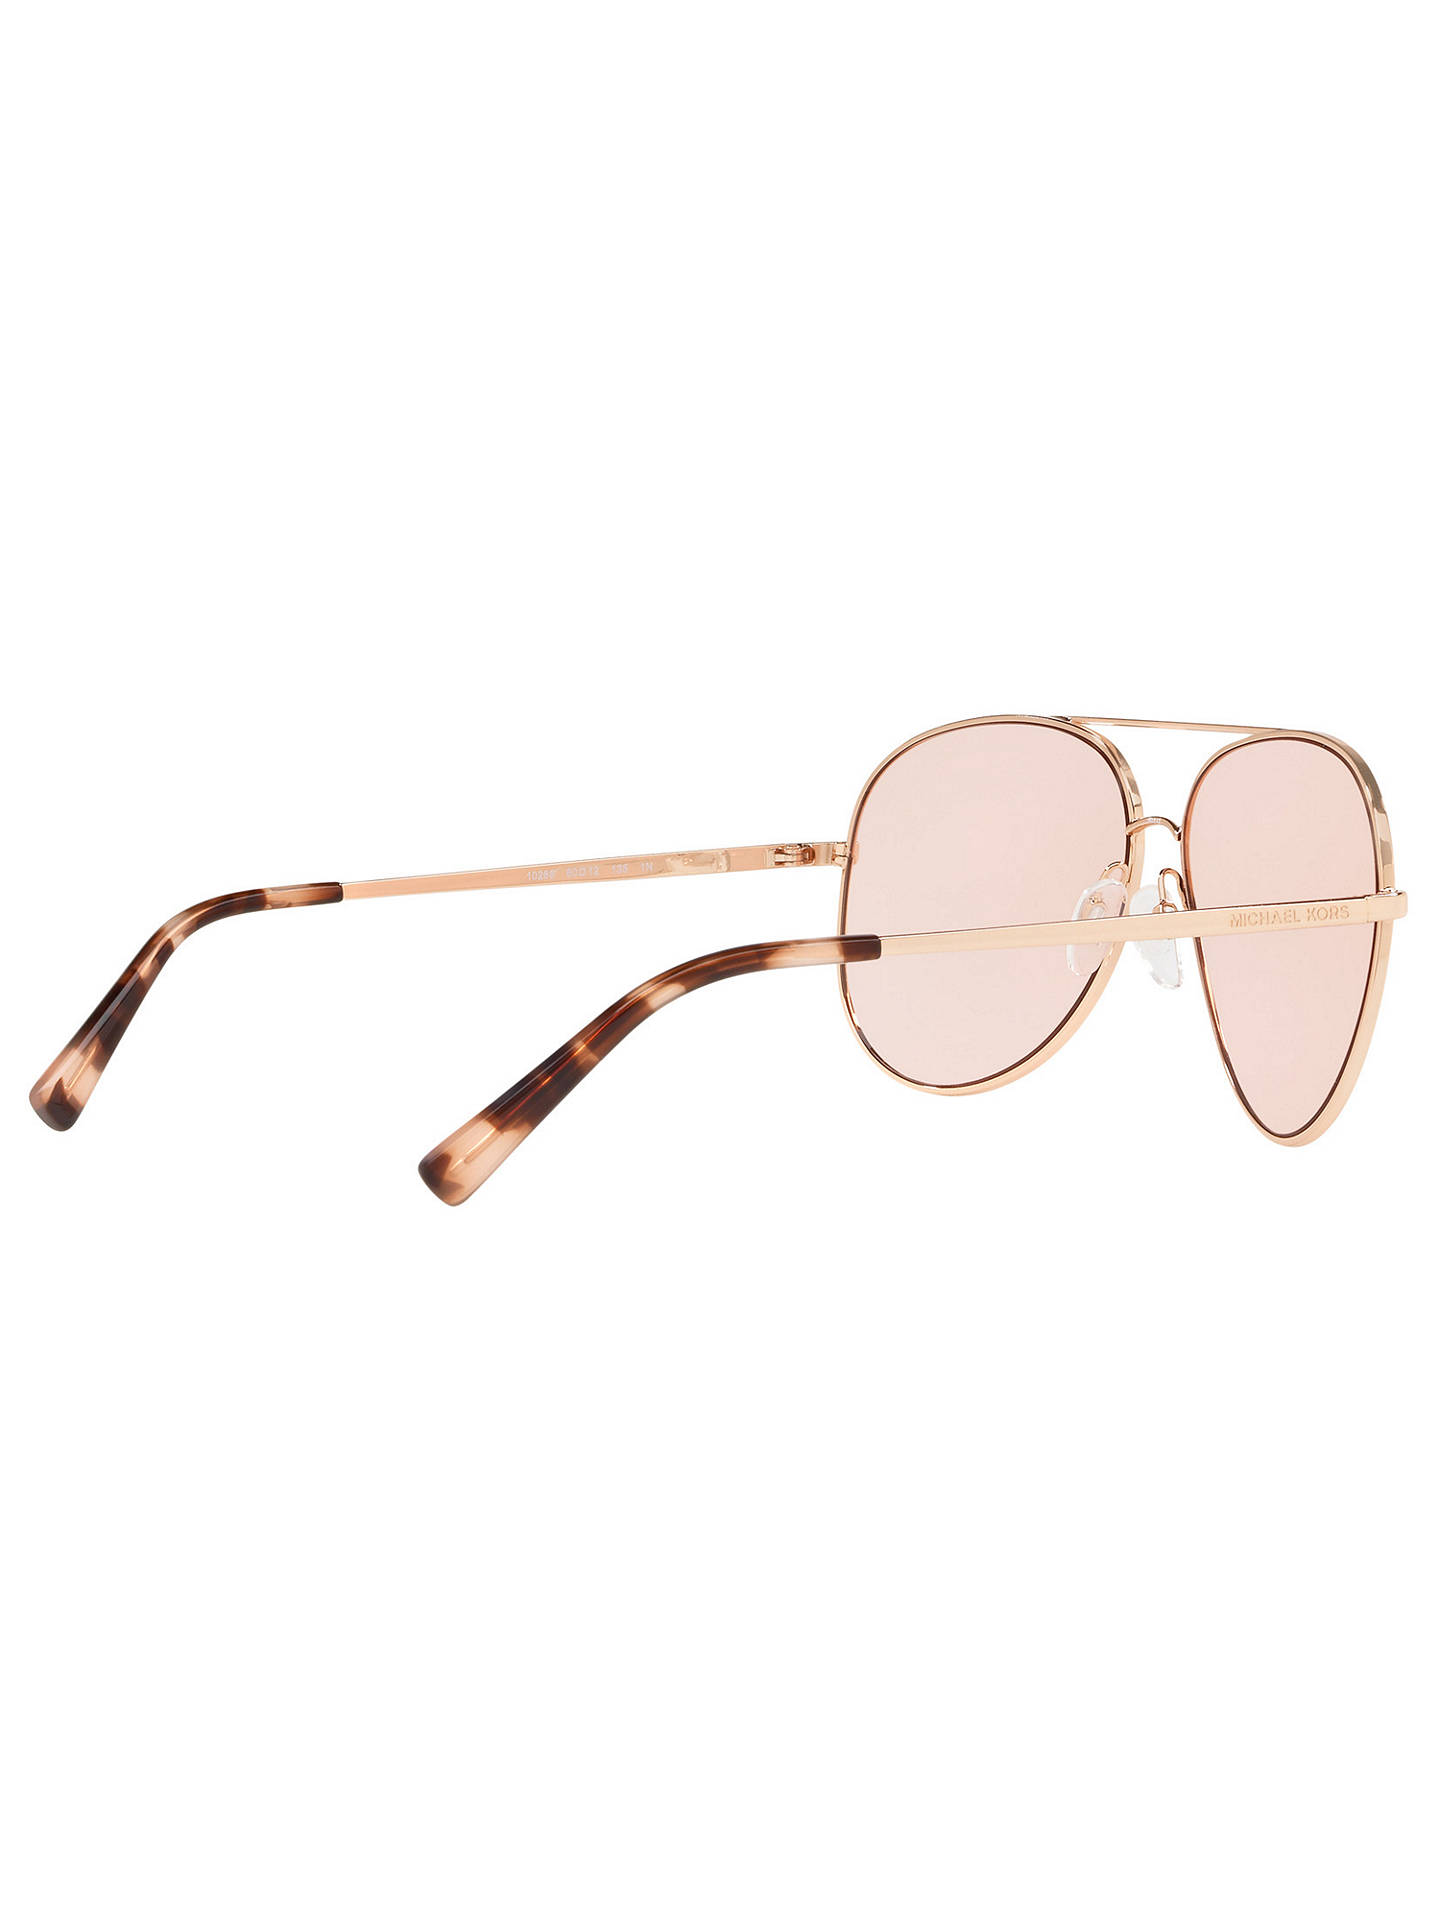 7c7a2056bcbae ... Buy Michael Kors MK5016 Polarised Kendall I Aviator Sunglasses